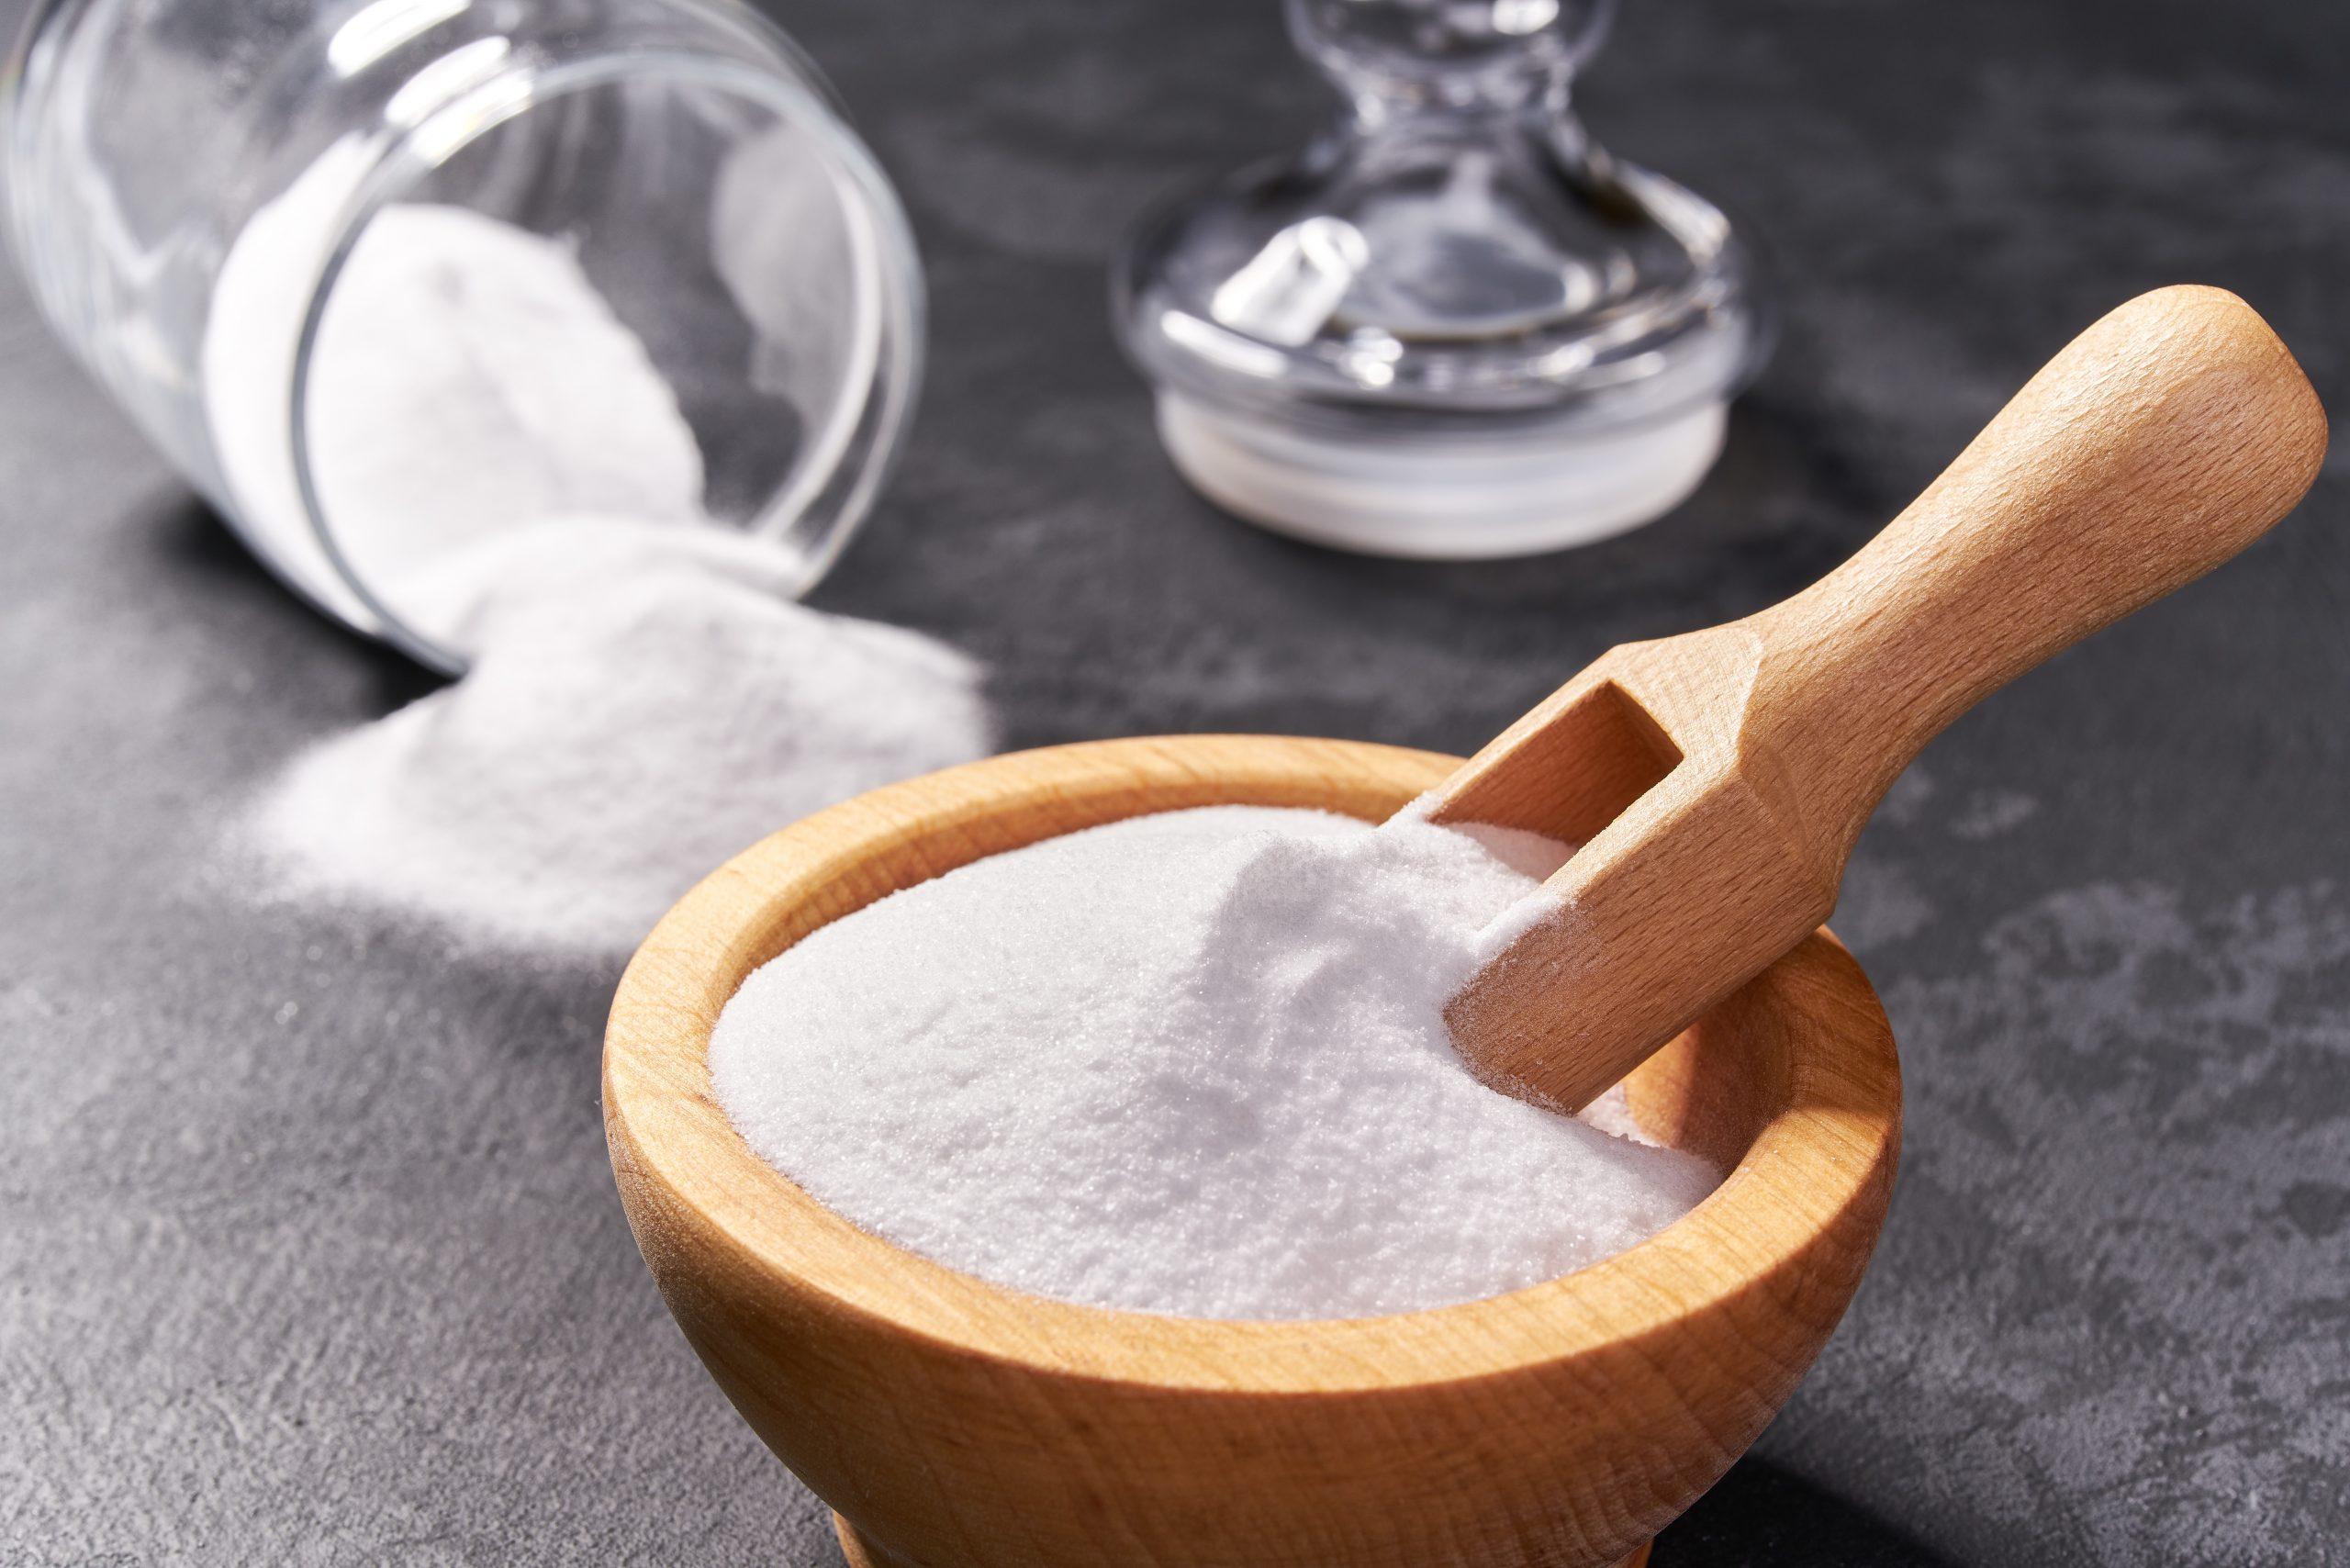 Nutrition X-Change Vol. 9 - Sodium Bicarbonate: More Than Just Baking Powder